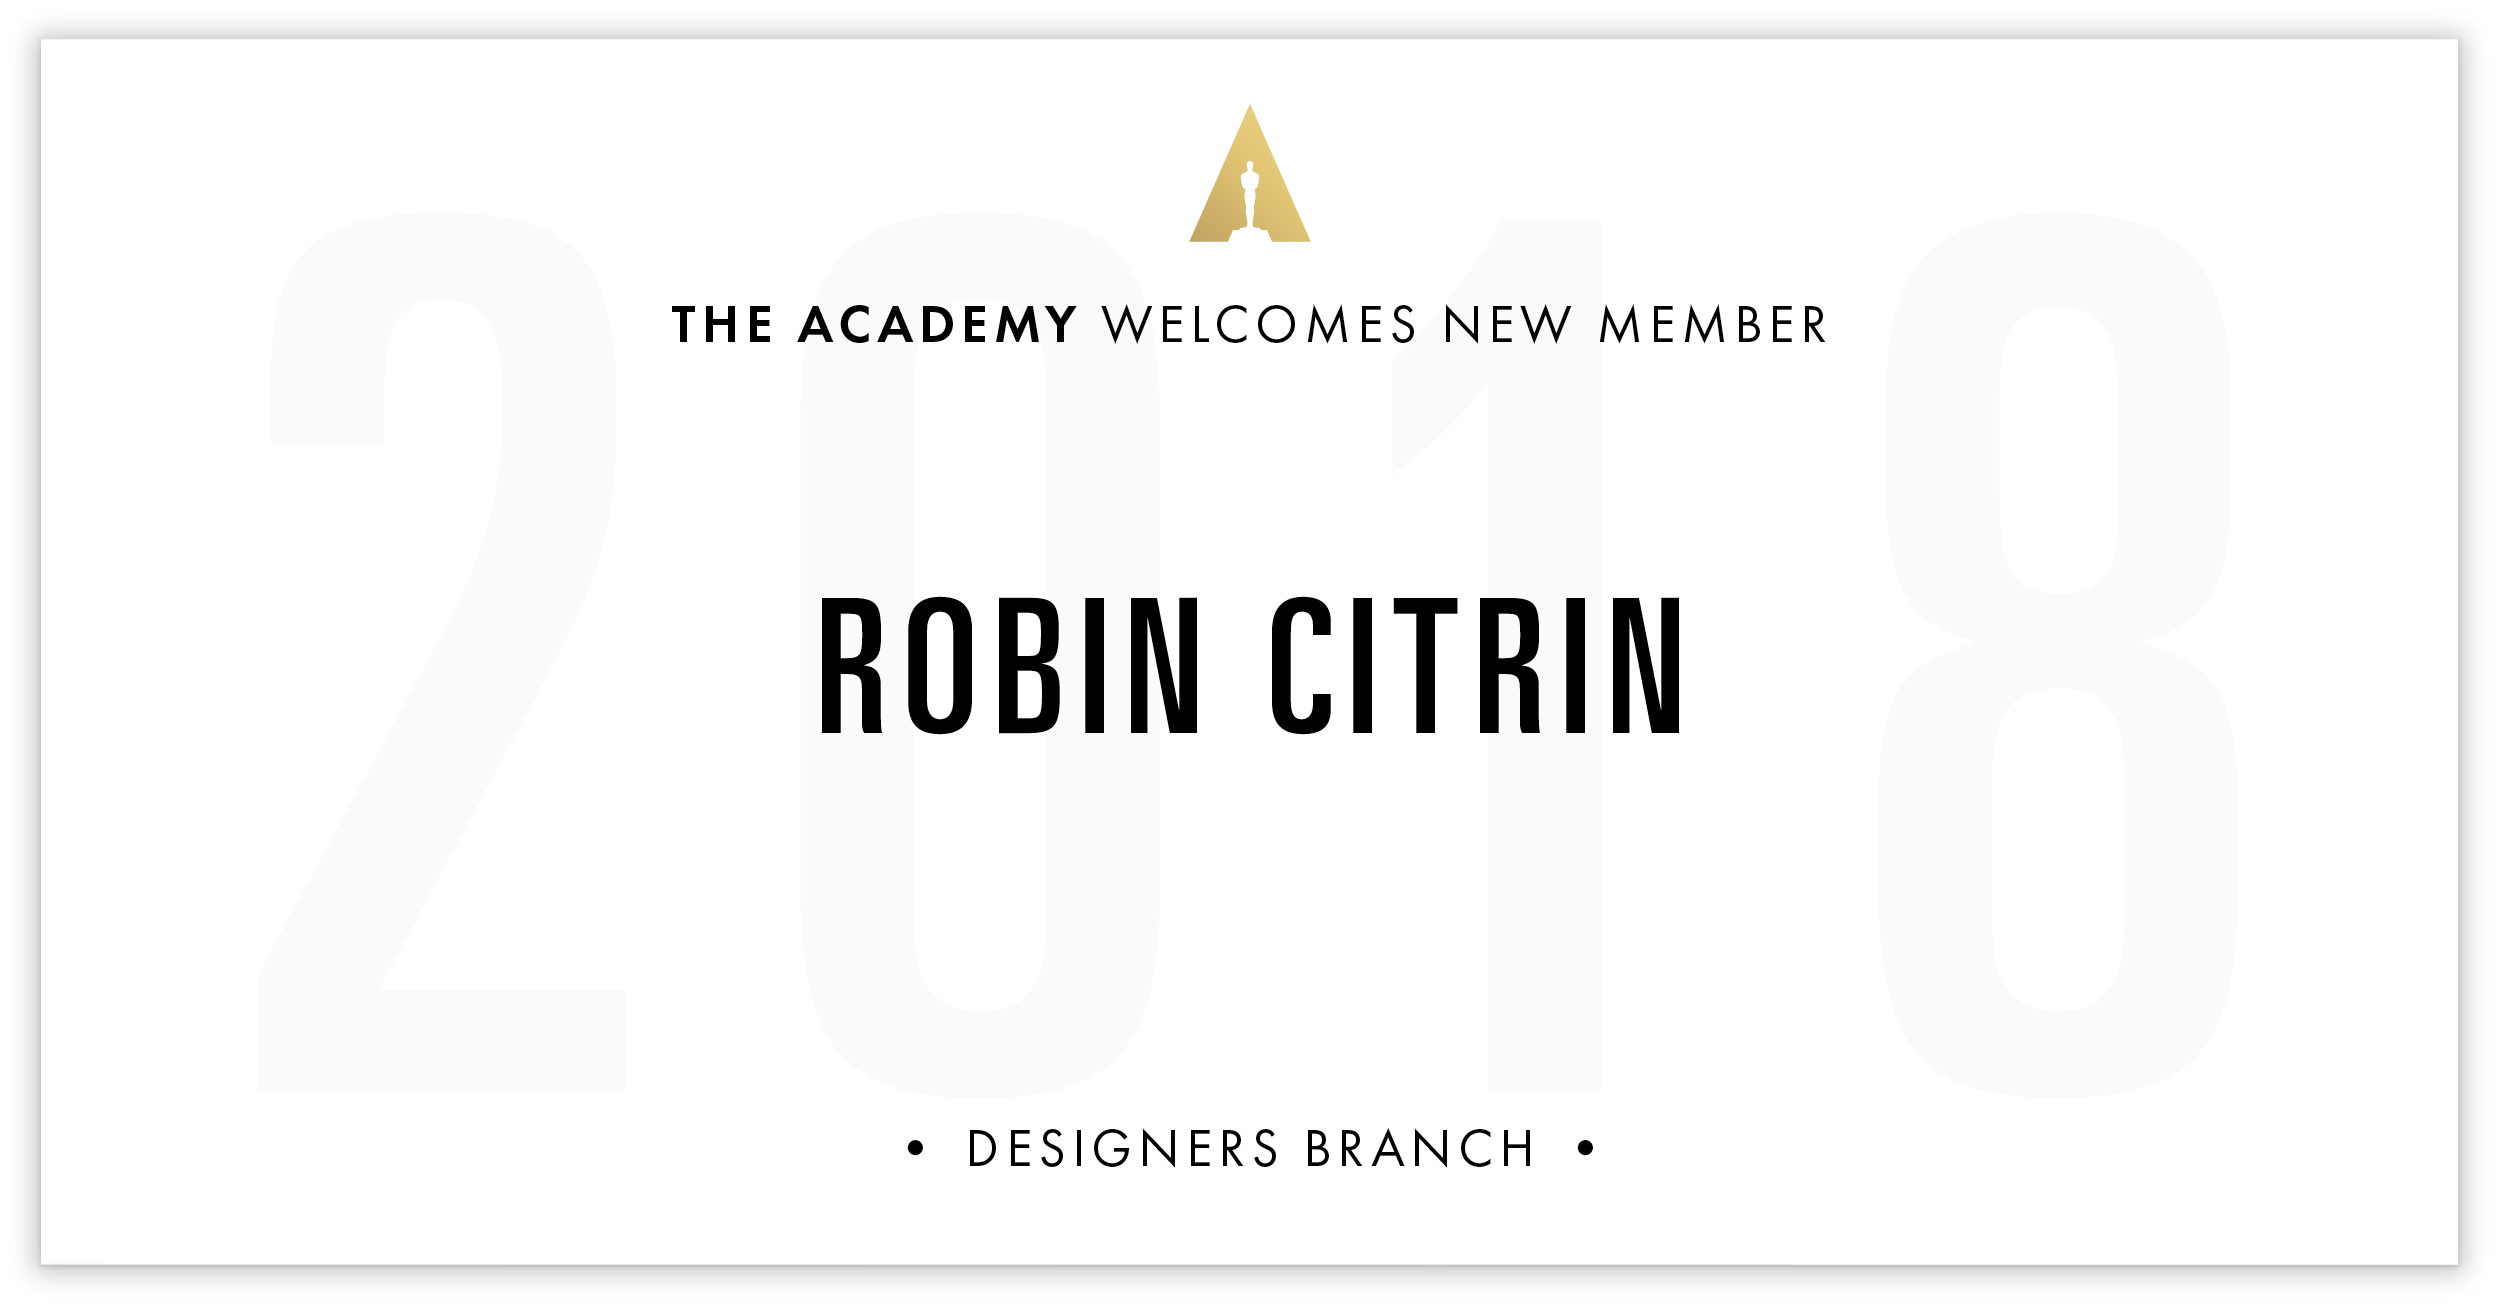 Robin Citrin is invited!